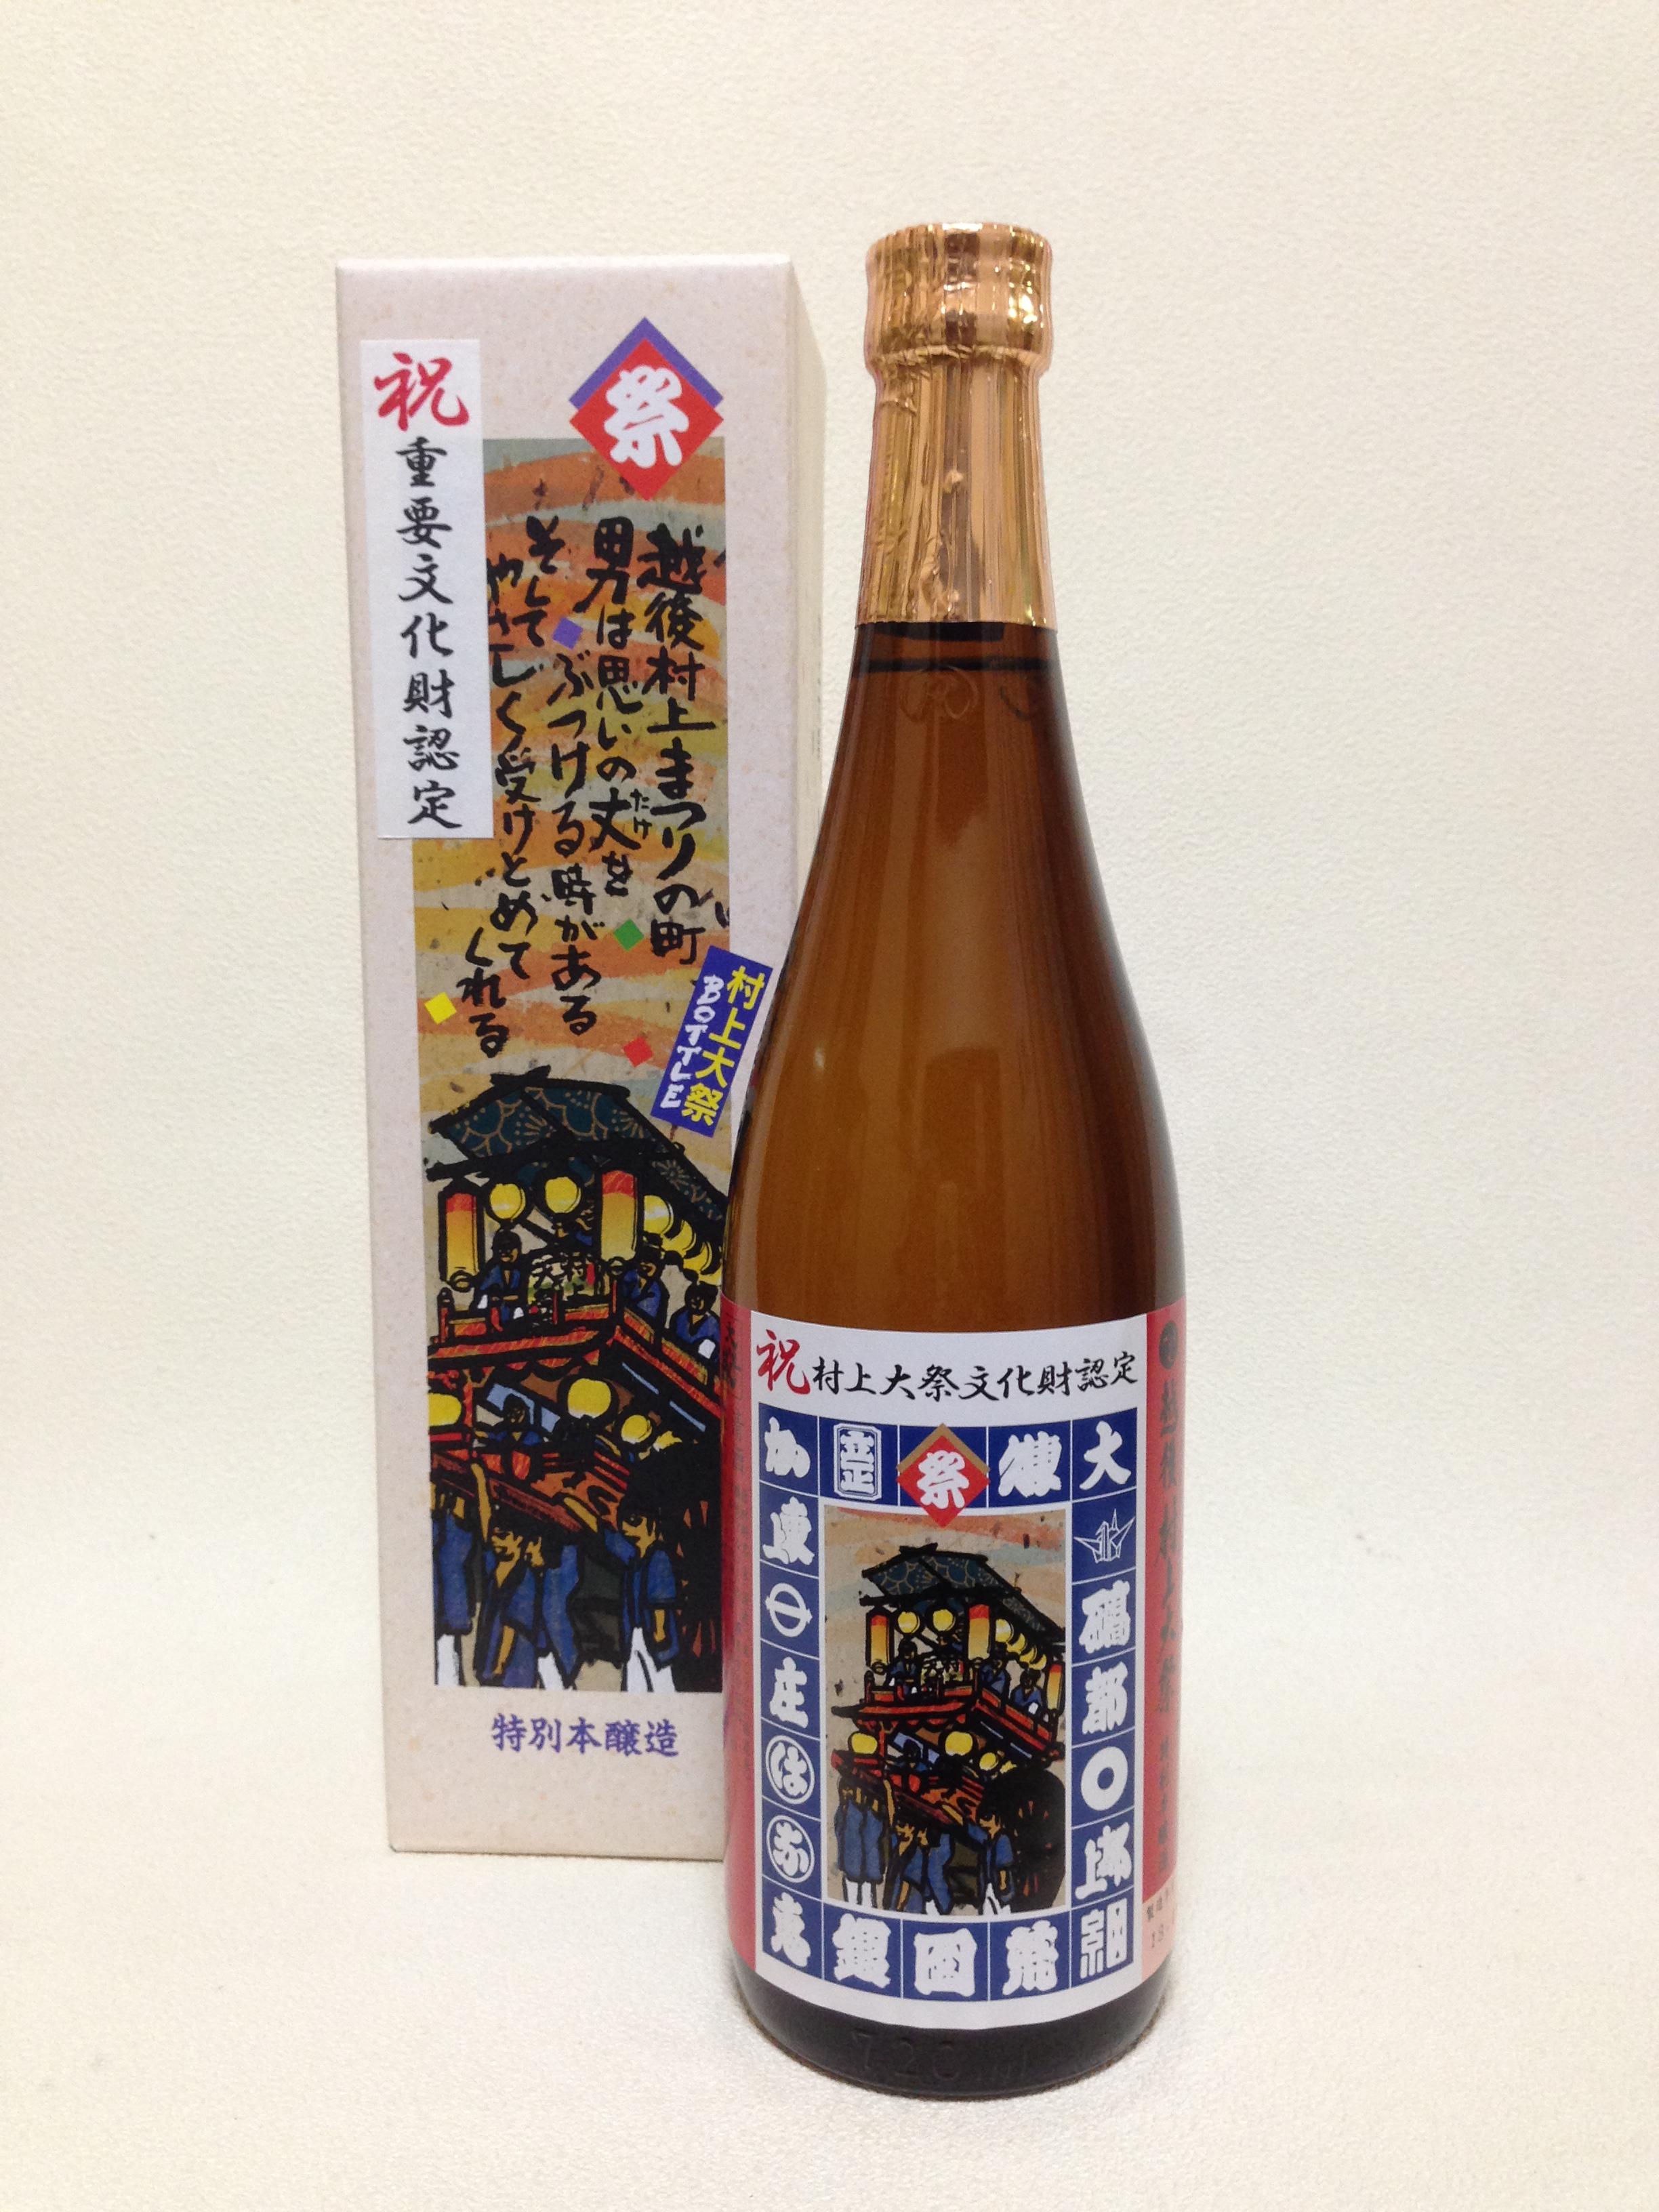 大洋盛 特別本醸造『村上大祭ボトル』 720ml